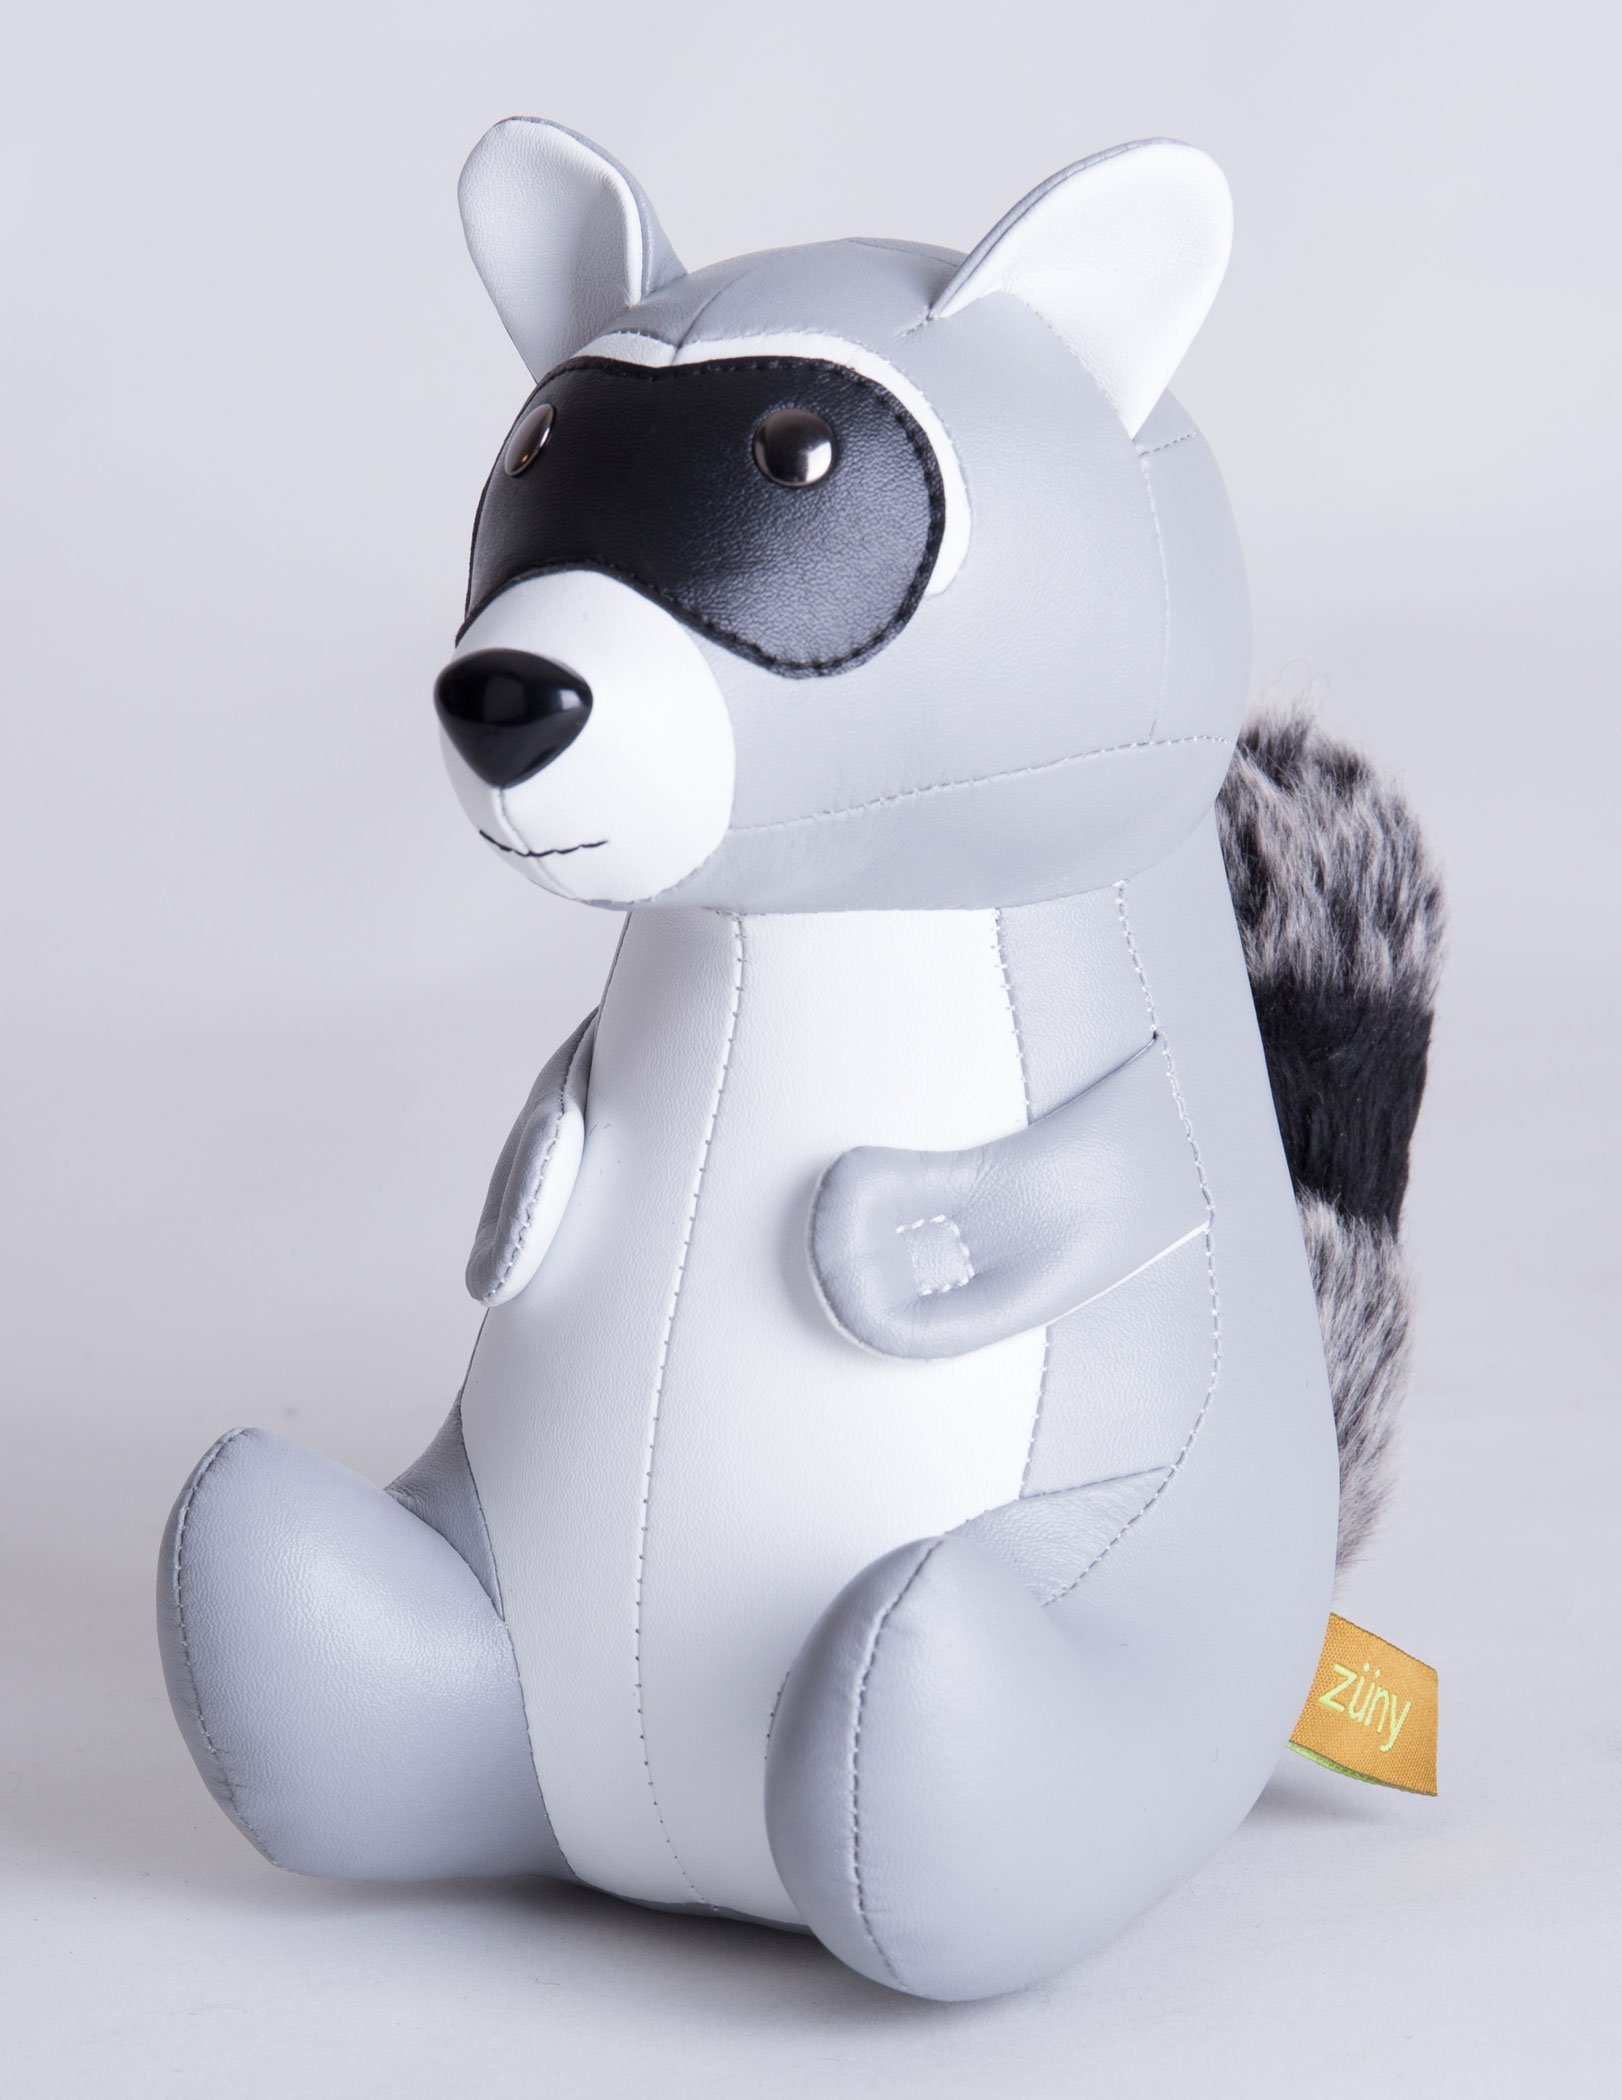 Zuny Raccoon Faux Leather Animal Bookend - Gray